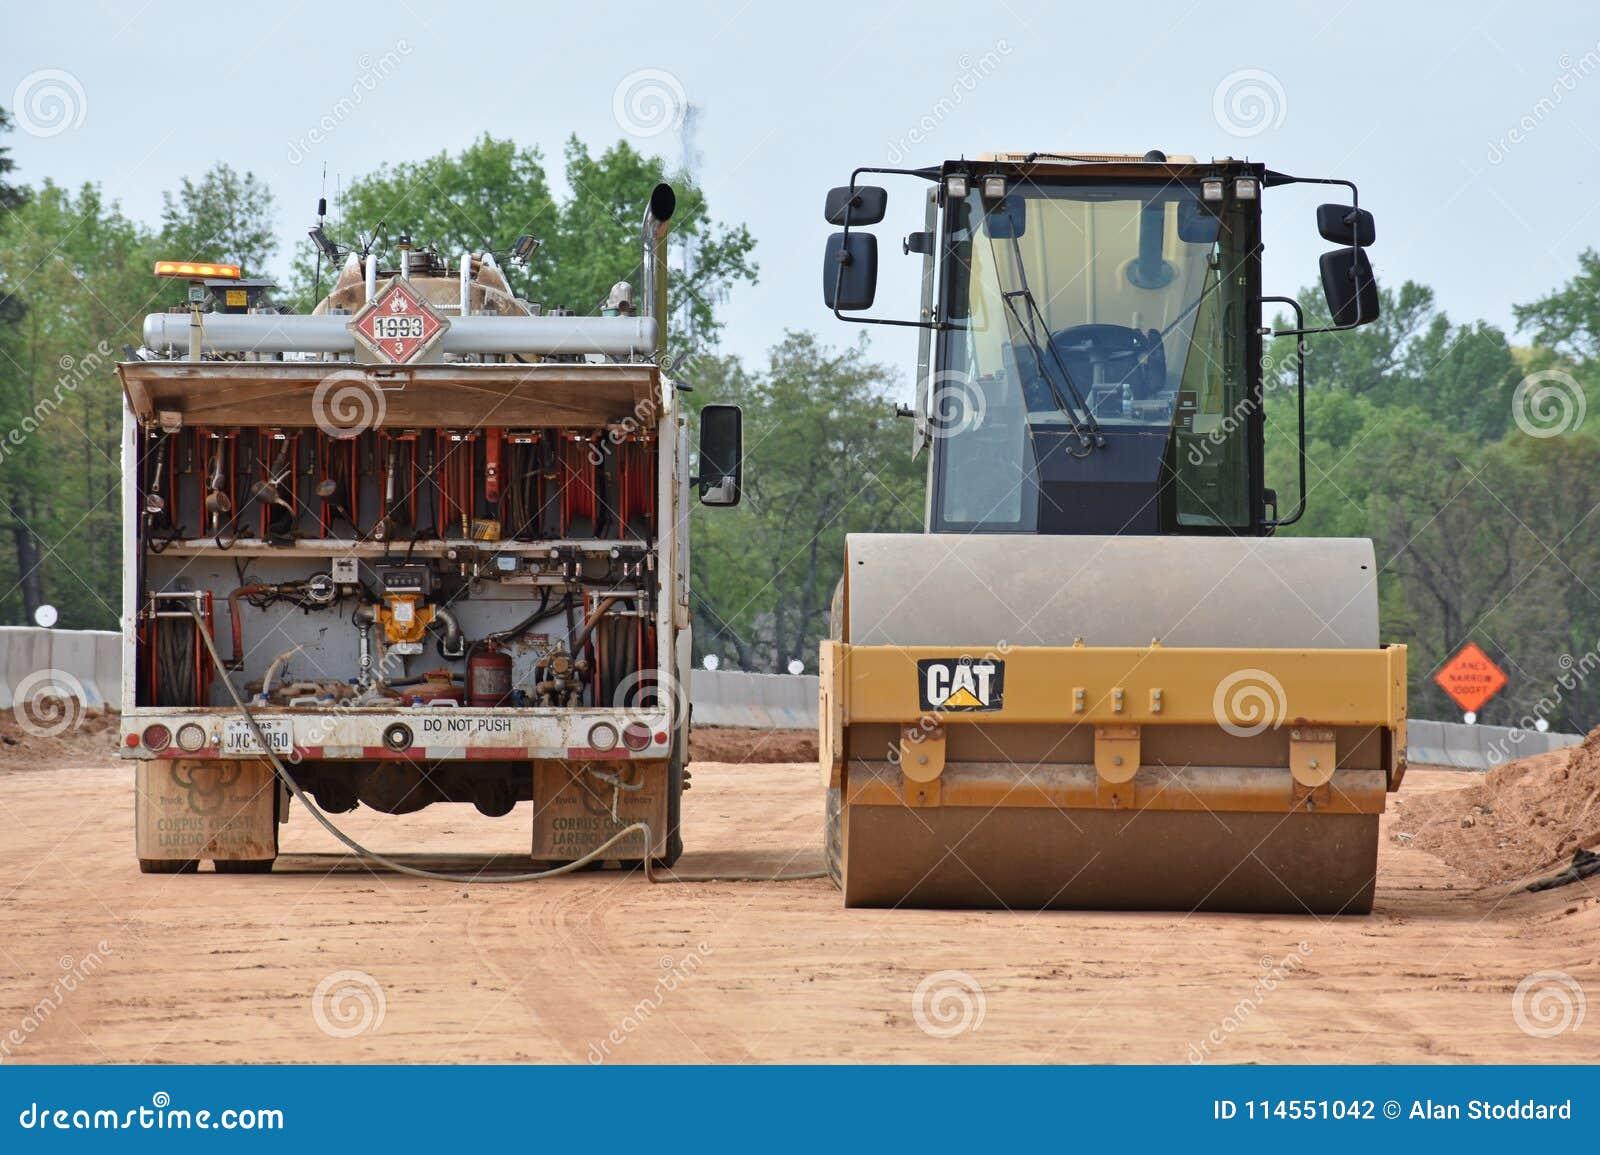 Roller machine gets refueled by fluids truck